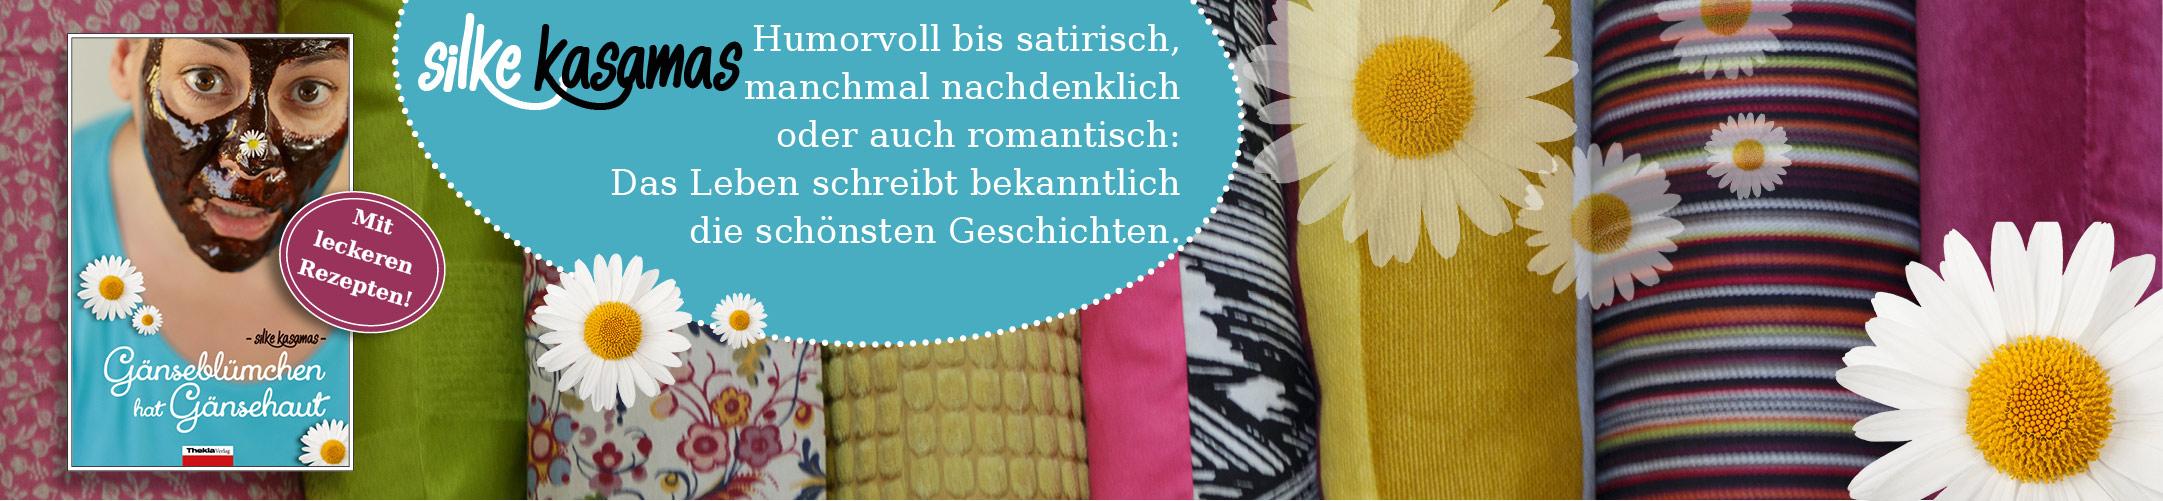 Thekla Verlag